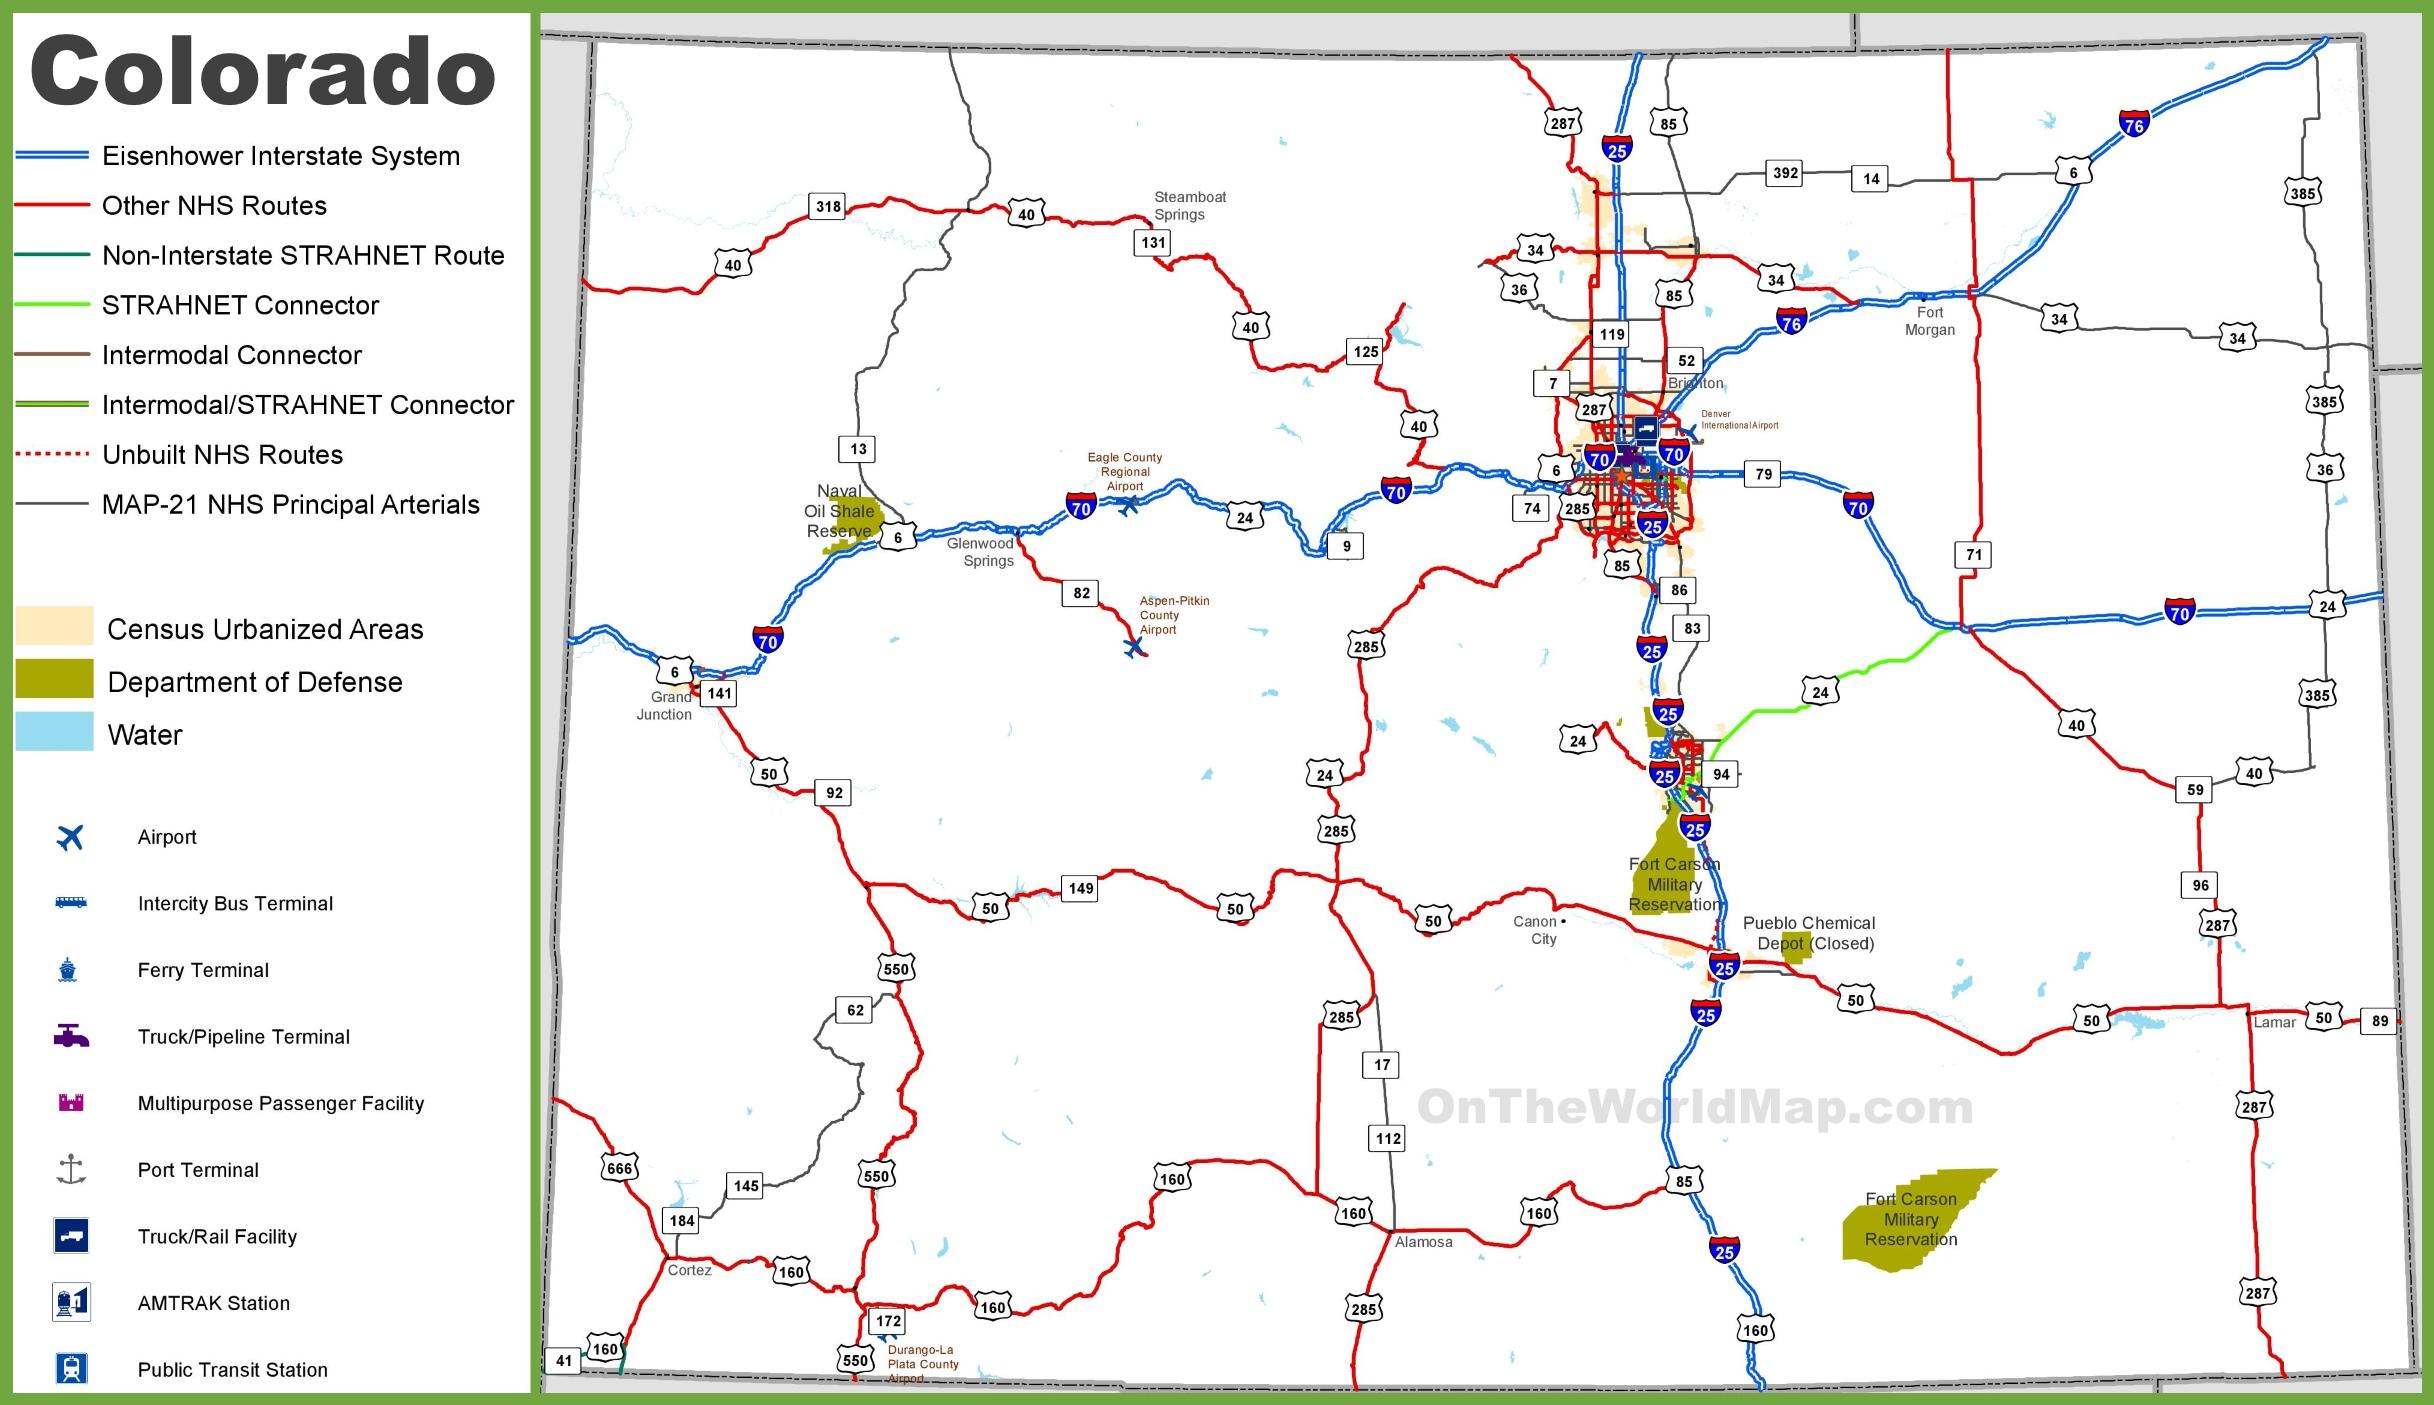 Colorado State Maps | Usa | Maps Of Colorado (Co) - Printable Road Map Of Colorado